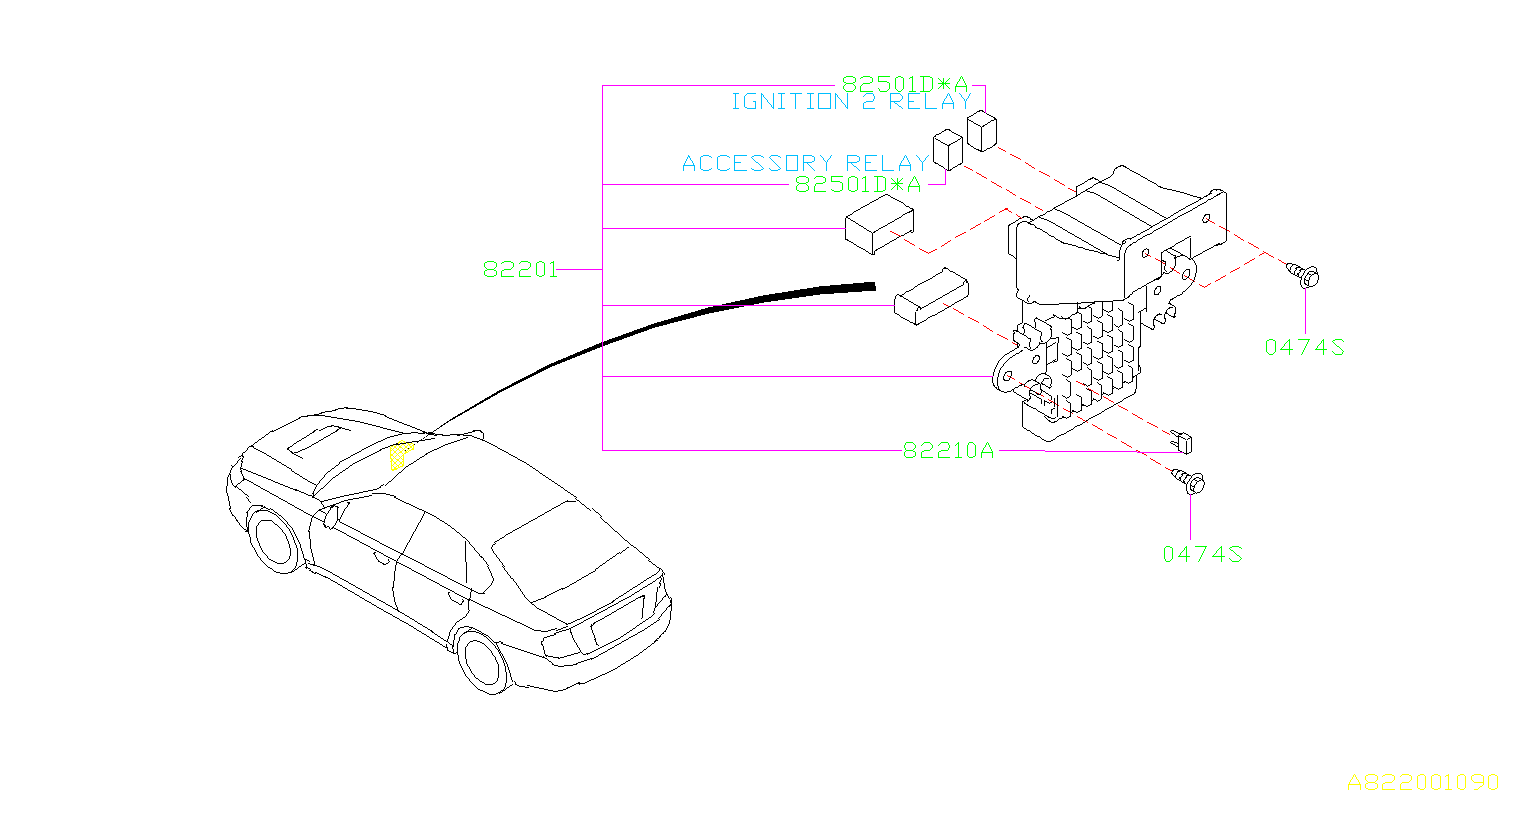 Subaru Legacy Accessory Power Relay